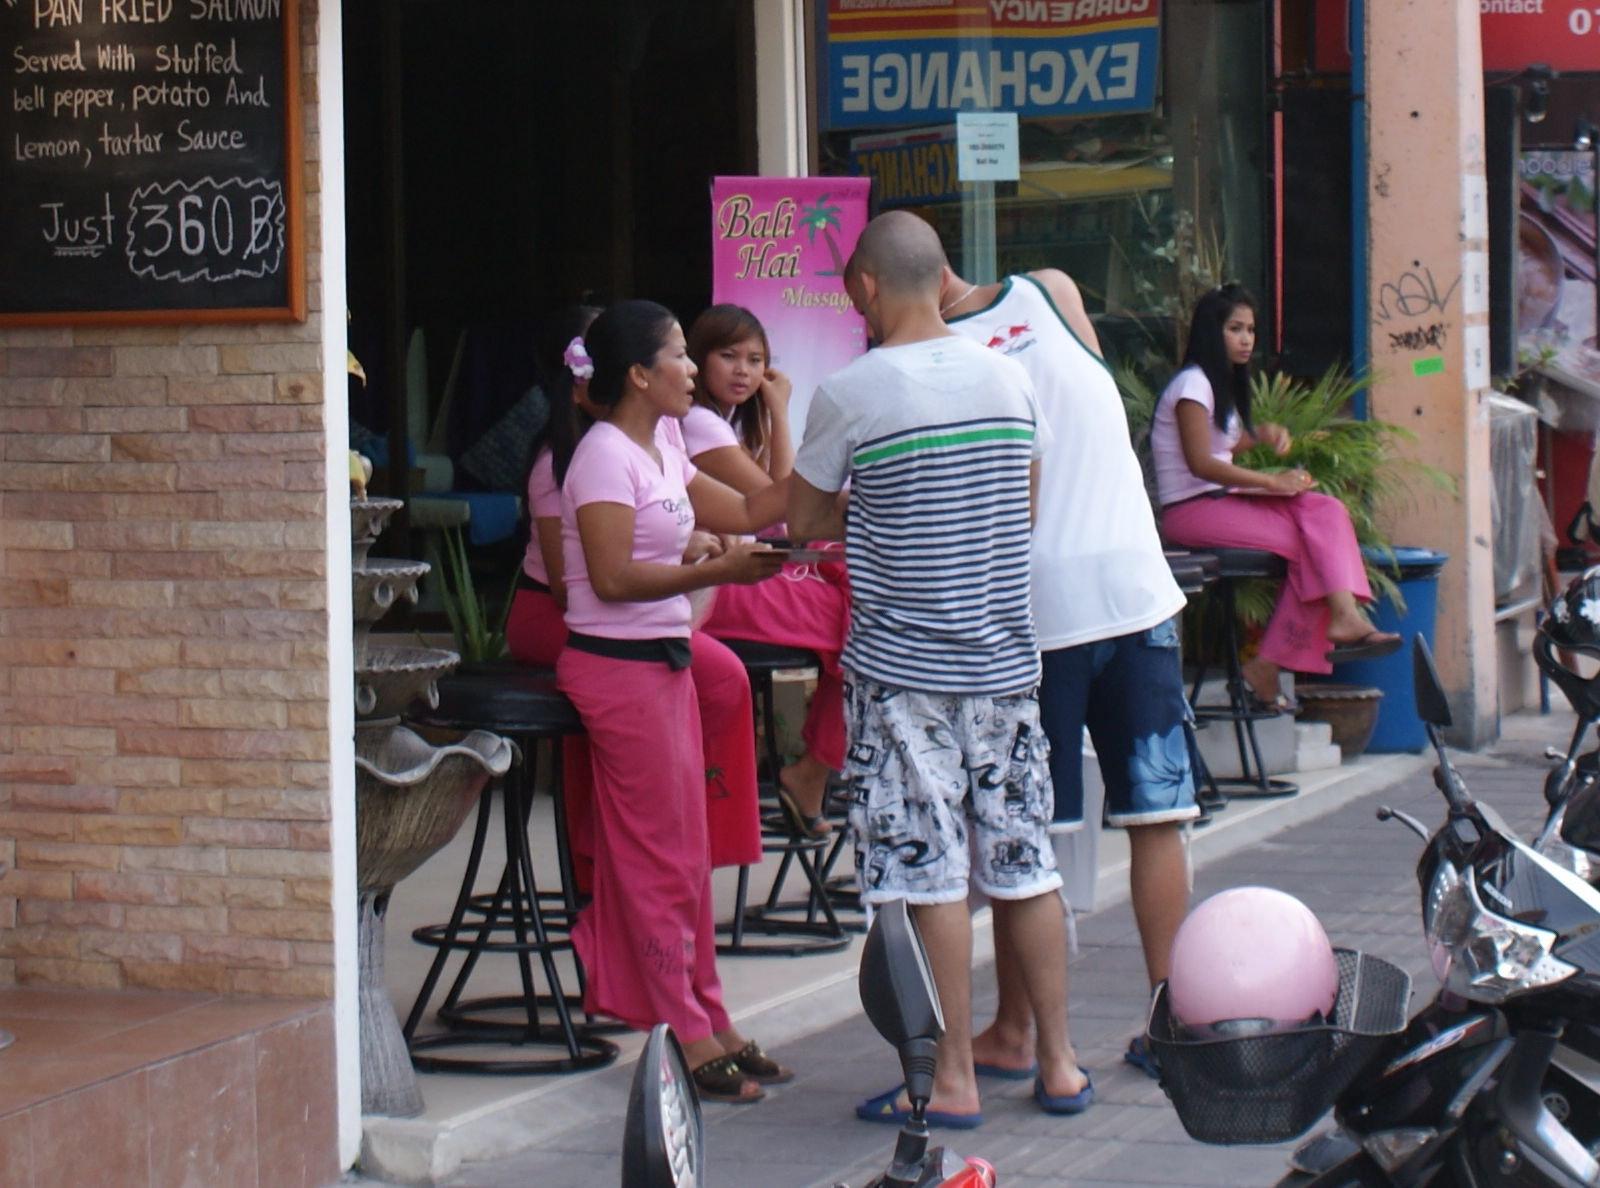 potensmidler priser thai massage østjylland